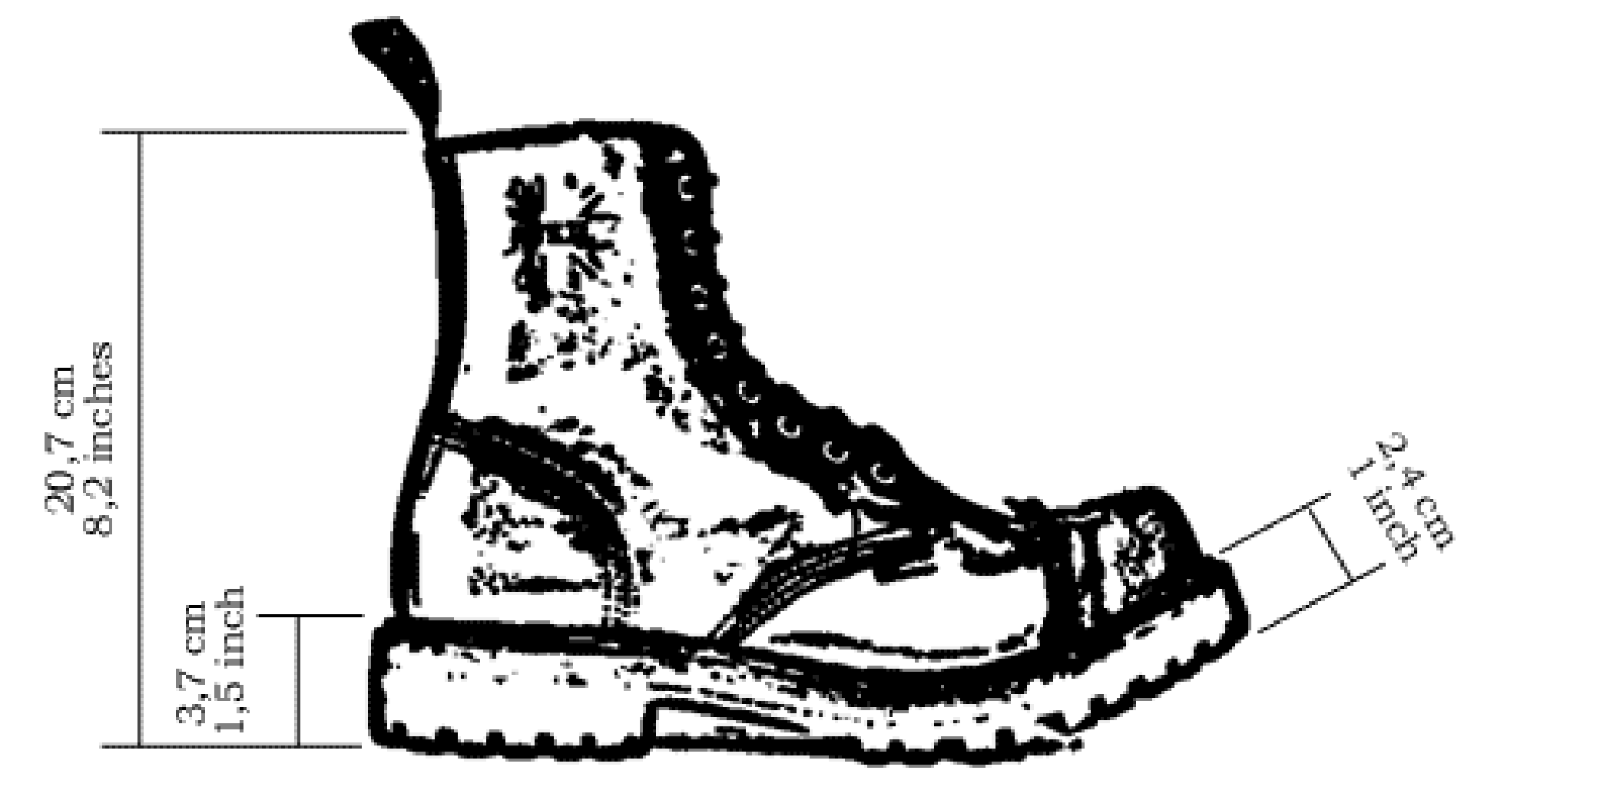 STEEL Black 8 Eyelet Boots UK12, Steel screws Capped Dble stckd sole with lugs & screws Steel 05d242